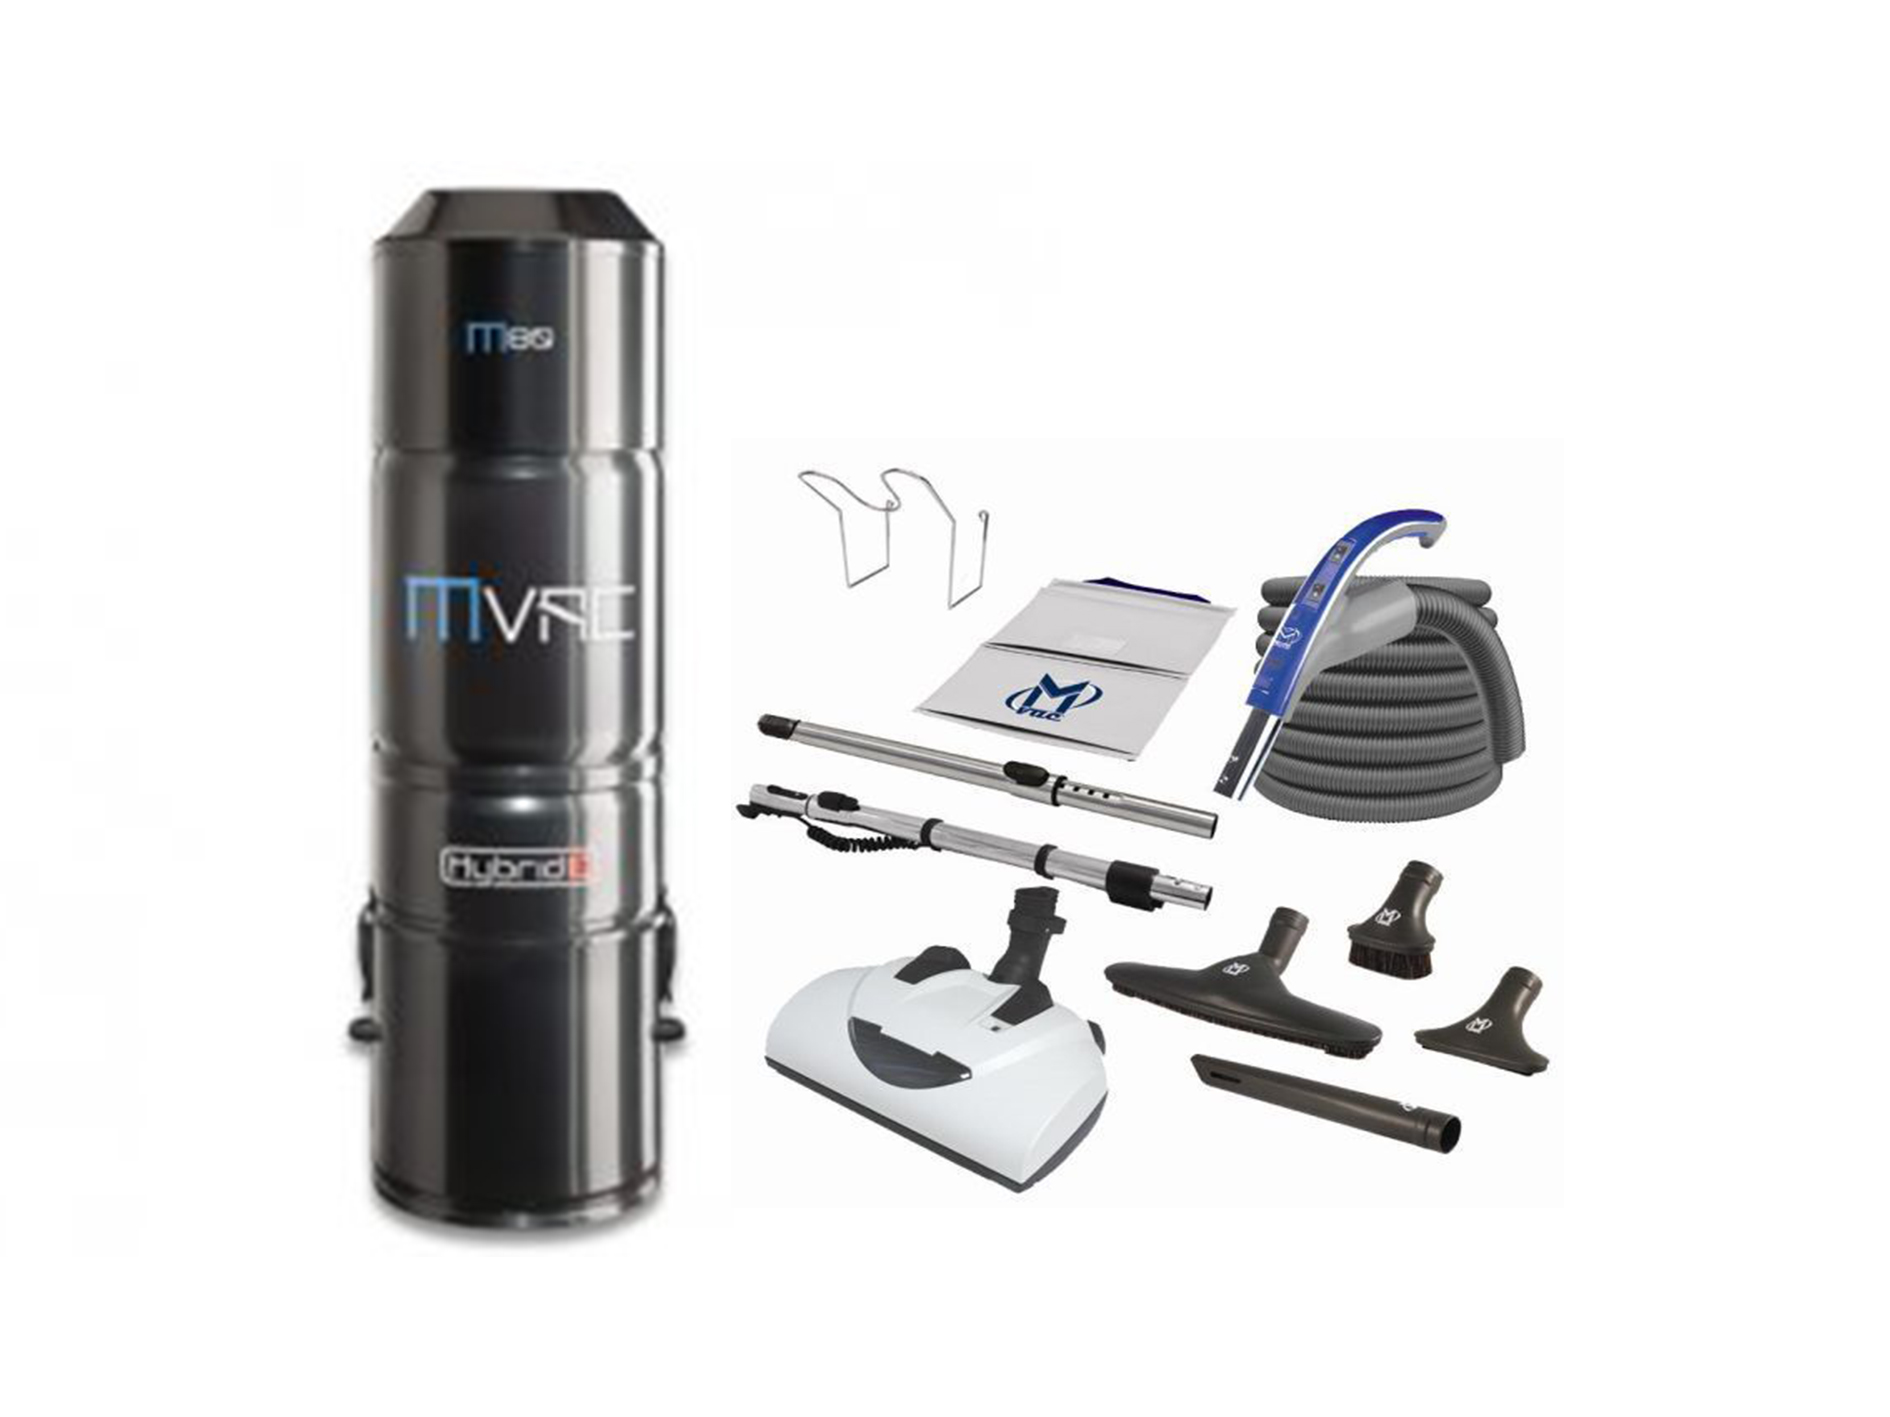 Mvac M80 Premium Electric Package Cardy Vacuum